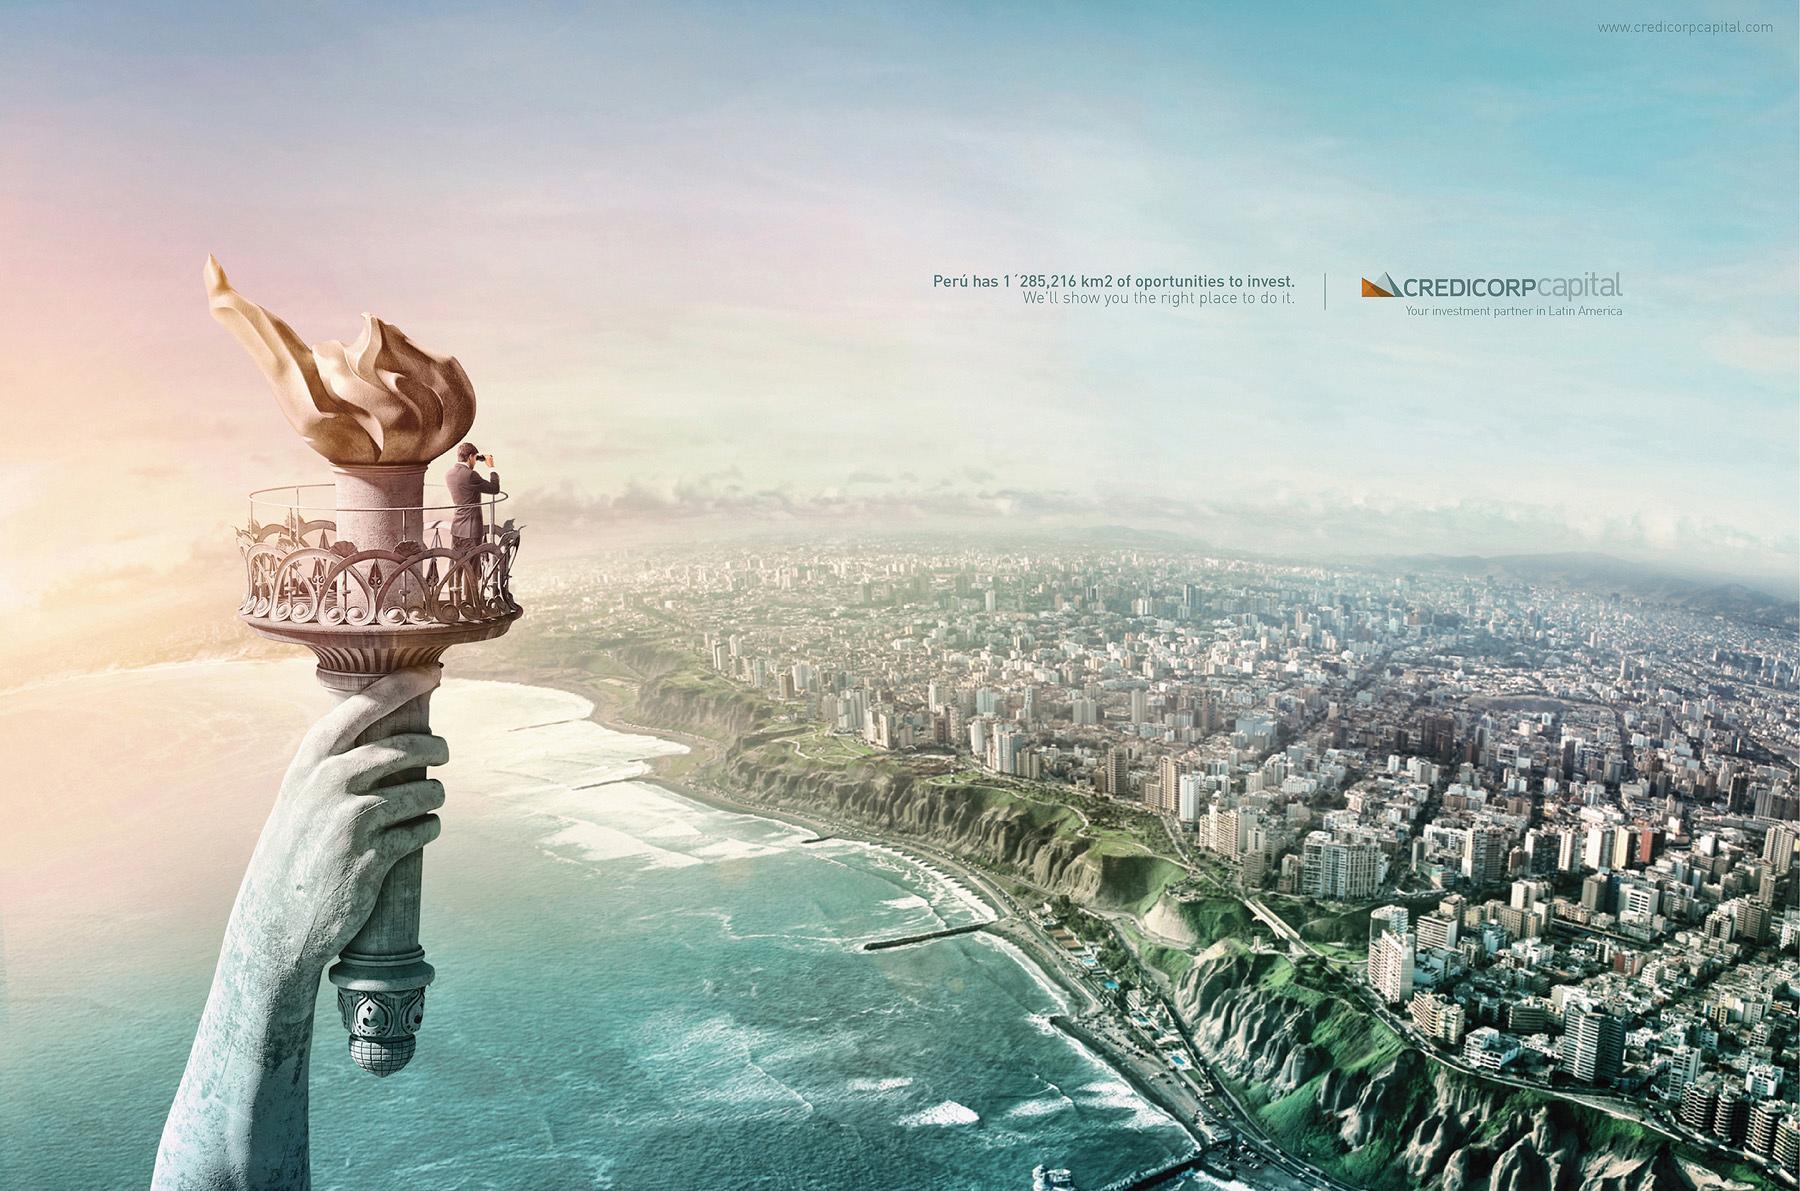 Credicorp Print Ad -  Peru